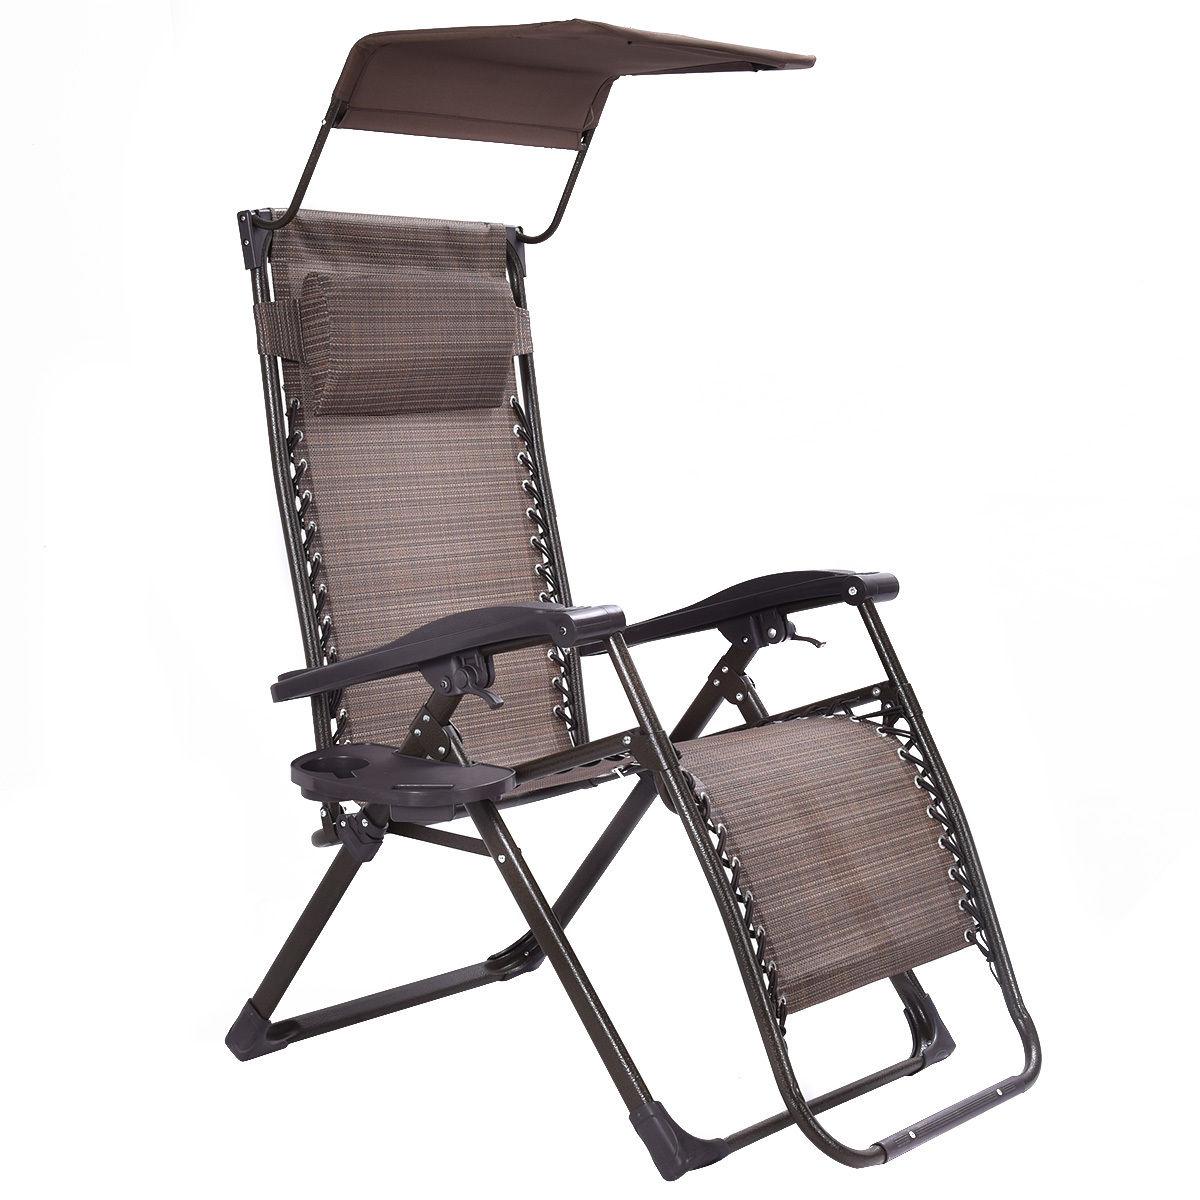 Gravity Lawn Chair Fold Up Bed Giantex Foldable Zero Lounge Patio Garden